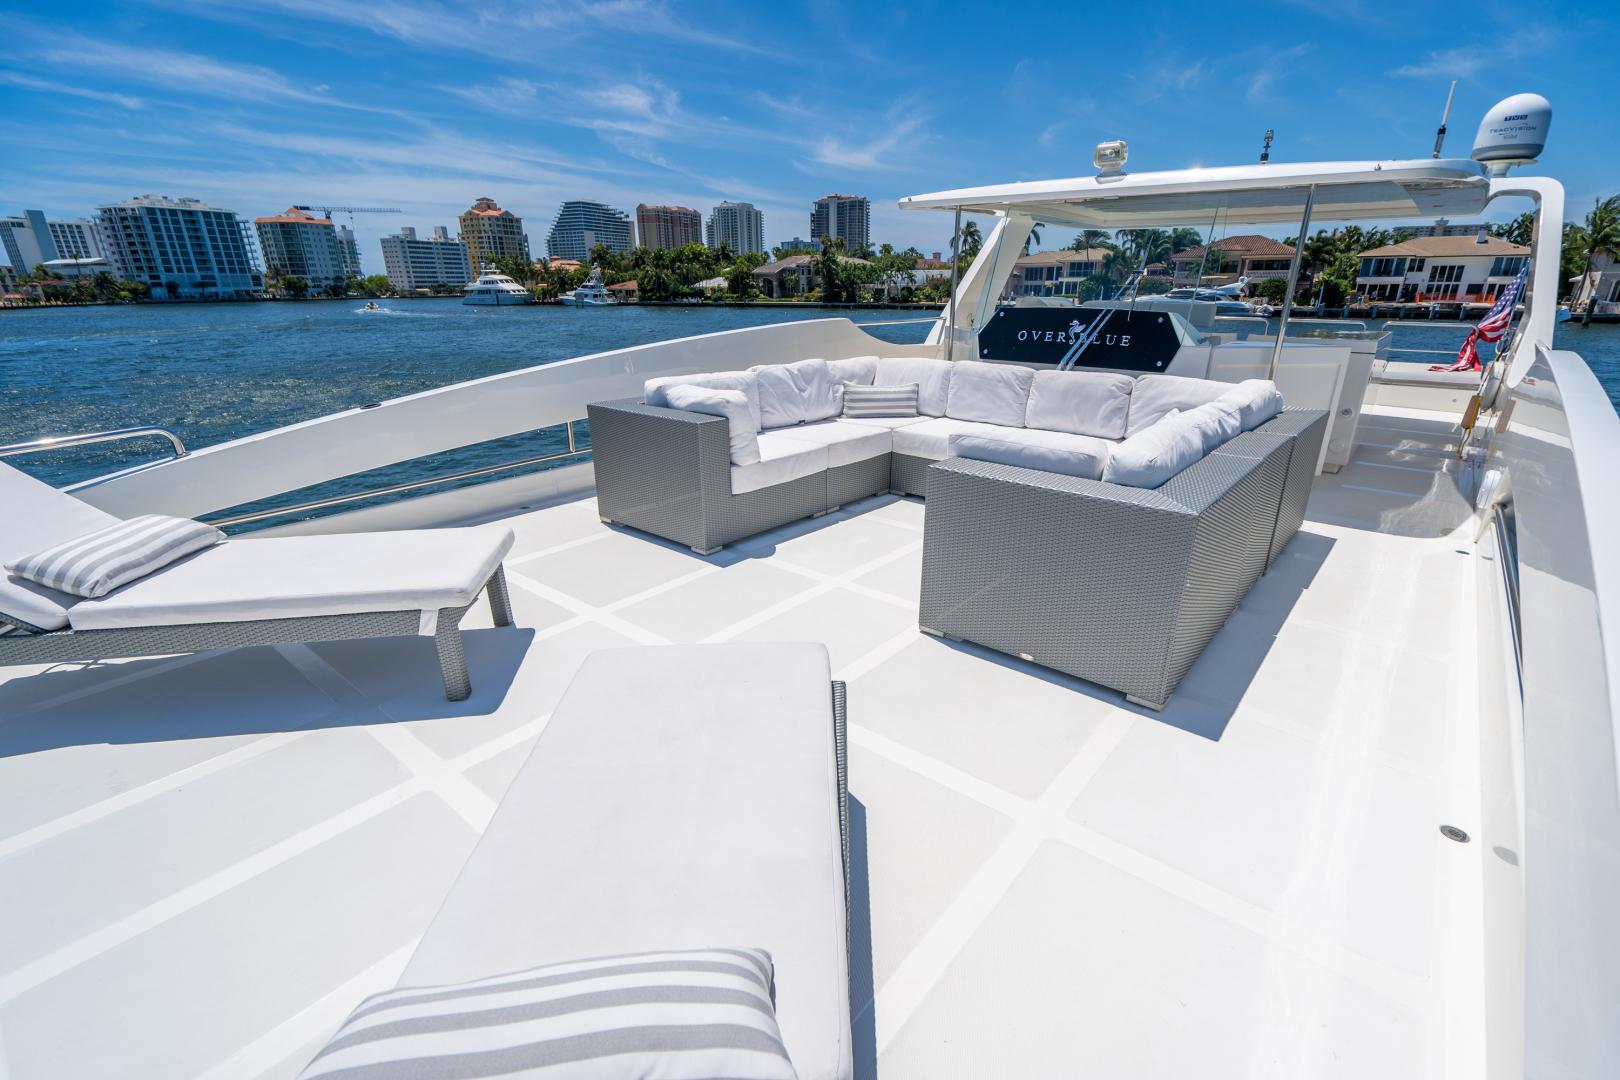 Overblue-58 Power Catamaran 2017-Techuila Ft. Lauderdale-Florida-United States-2017 Overblue 58 Powercat-1401228   Thumbnail